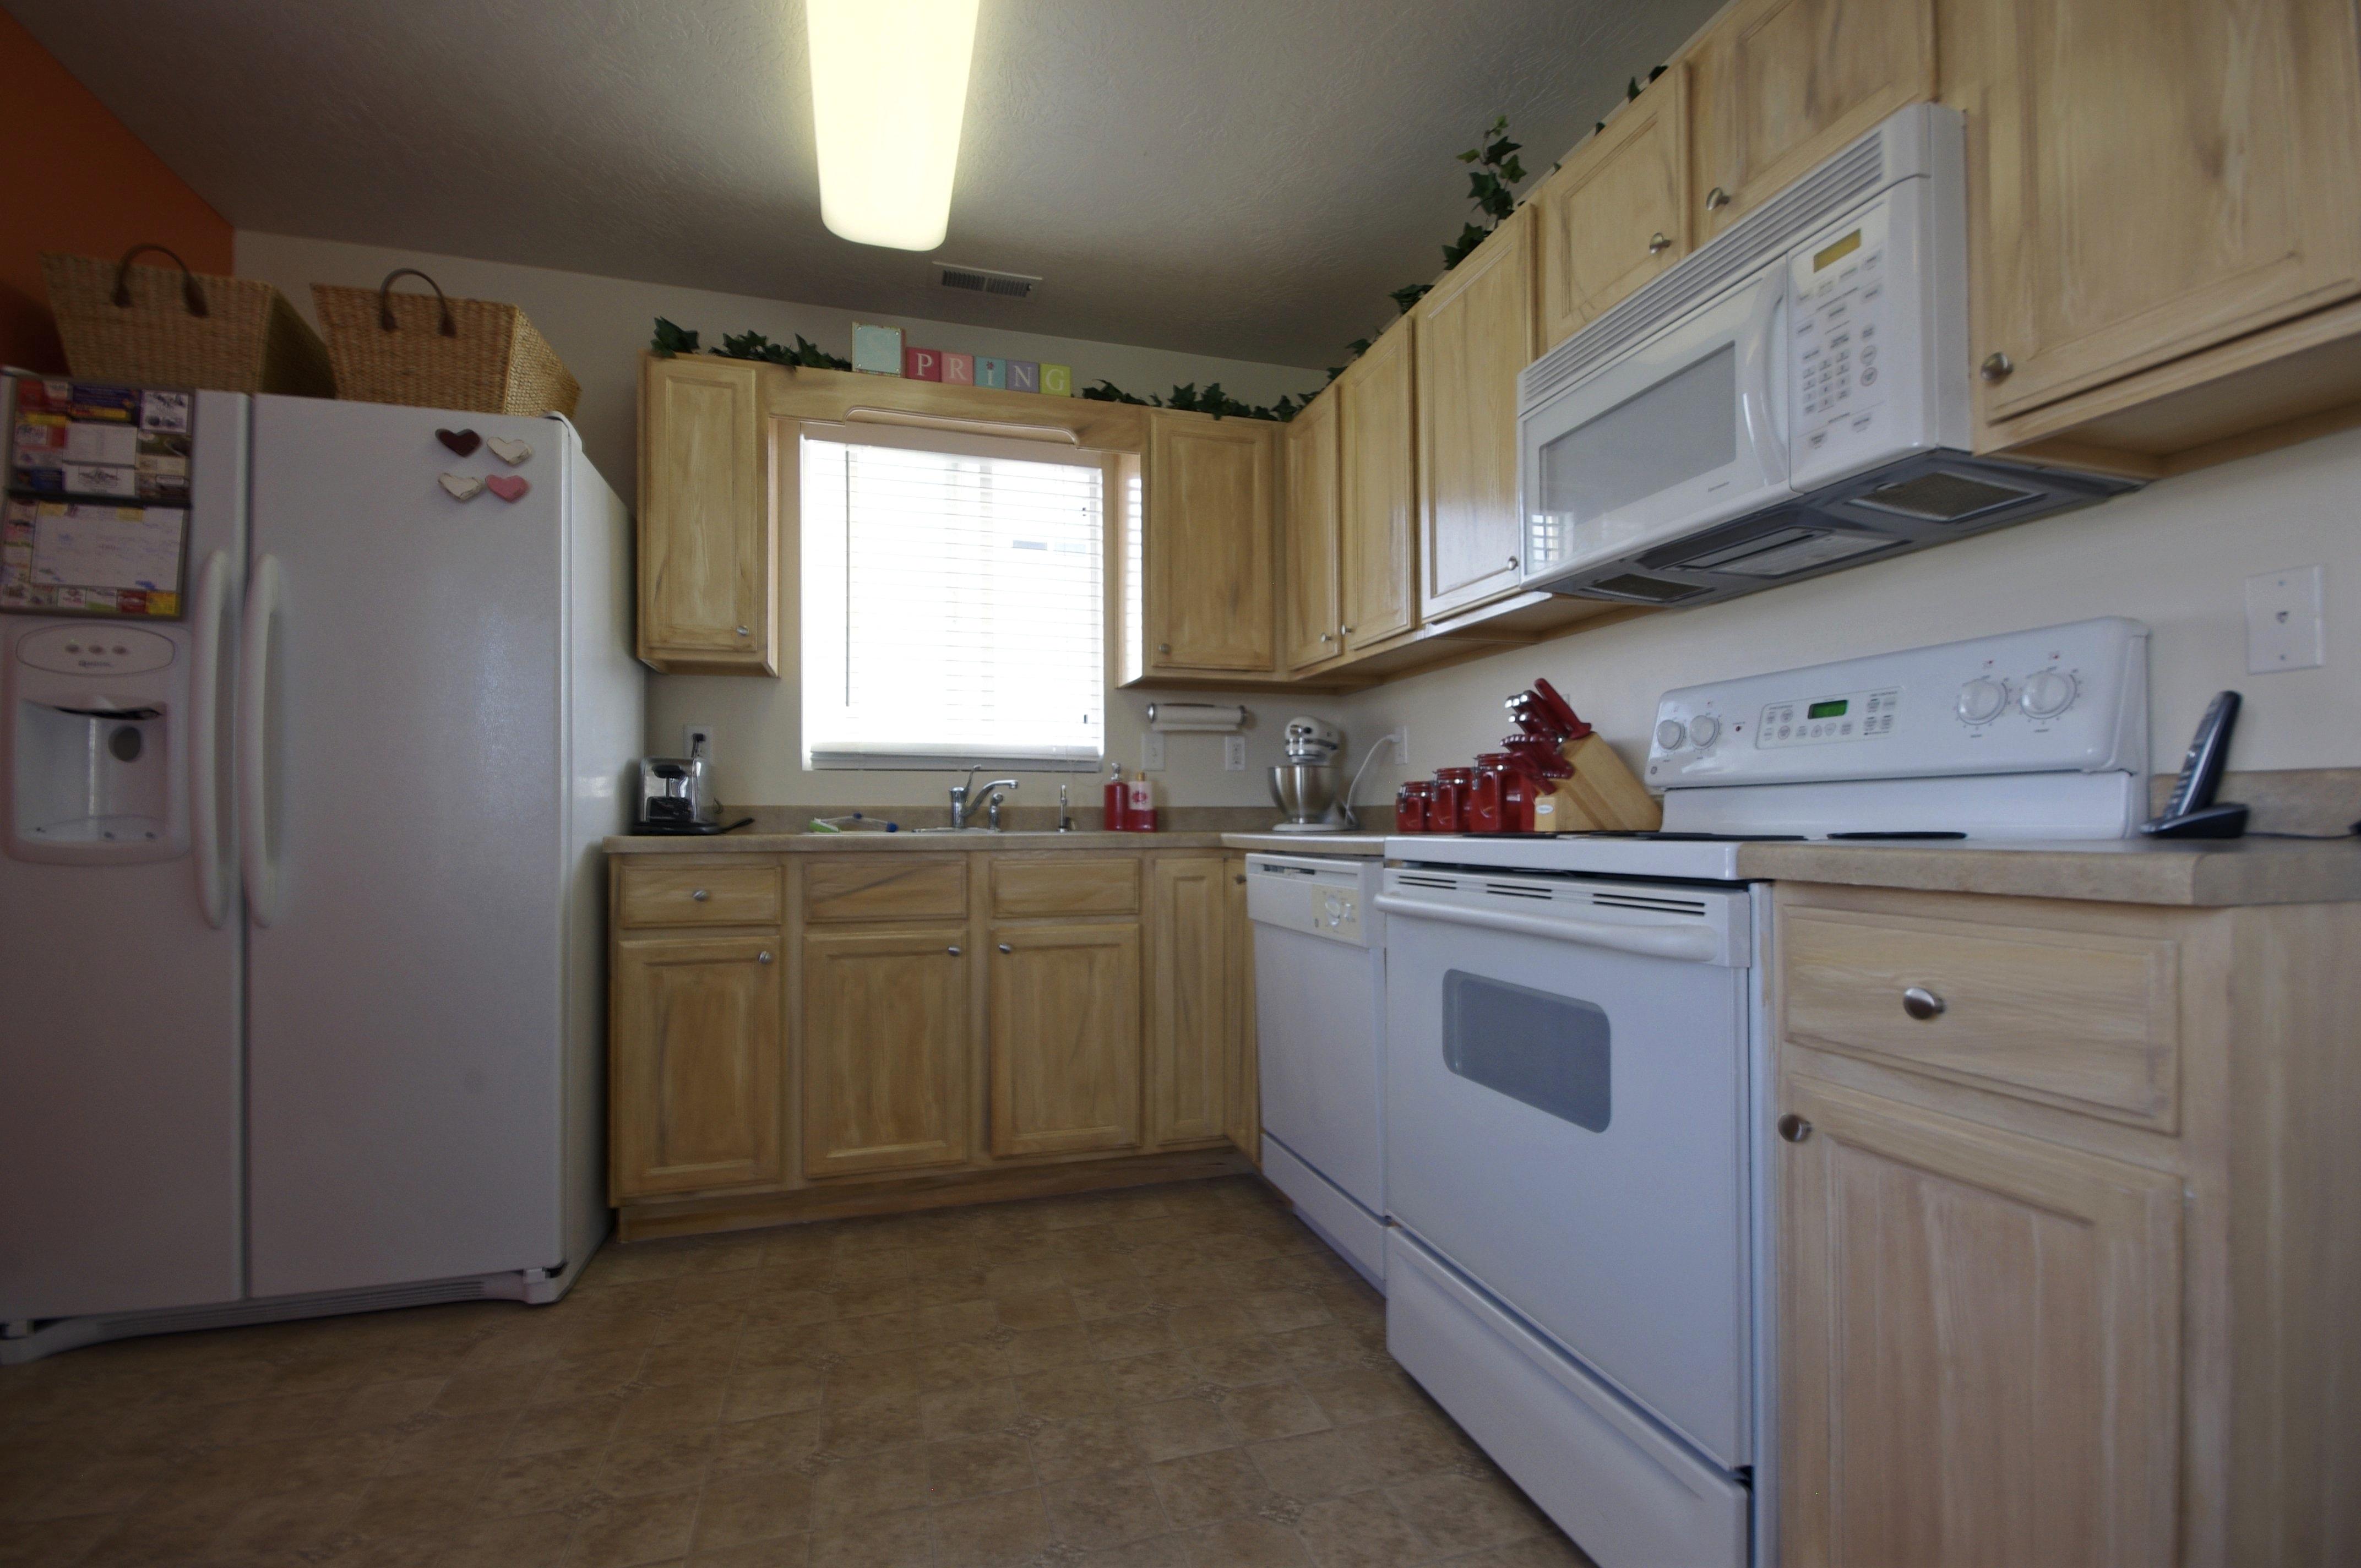 oak kitchen cabinets oak kitchen cabinets White wood kitchen cabinets wood grained to match white oak